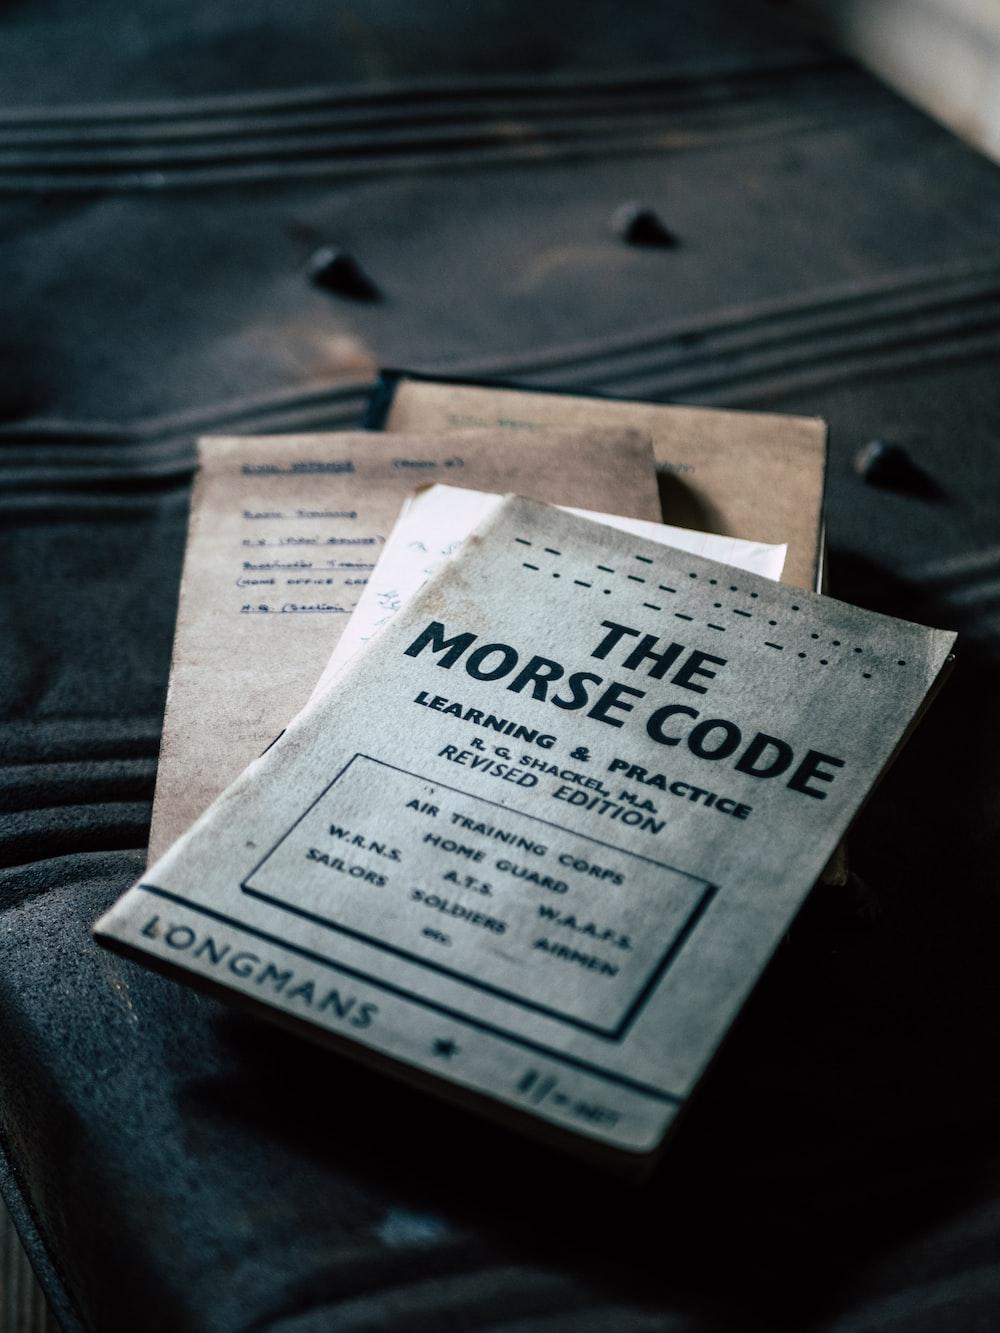 The Morse Code book